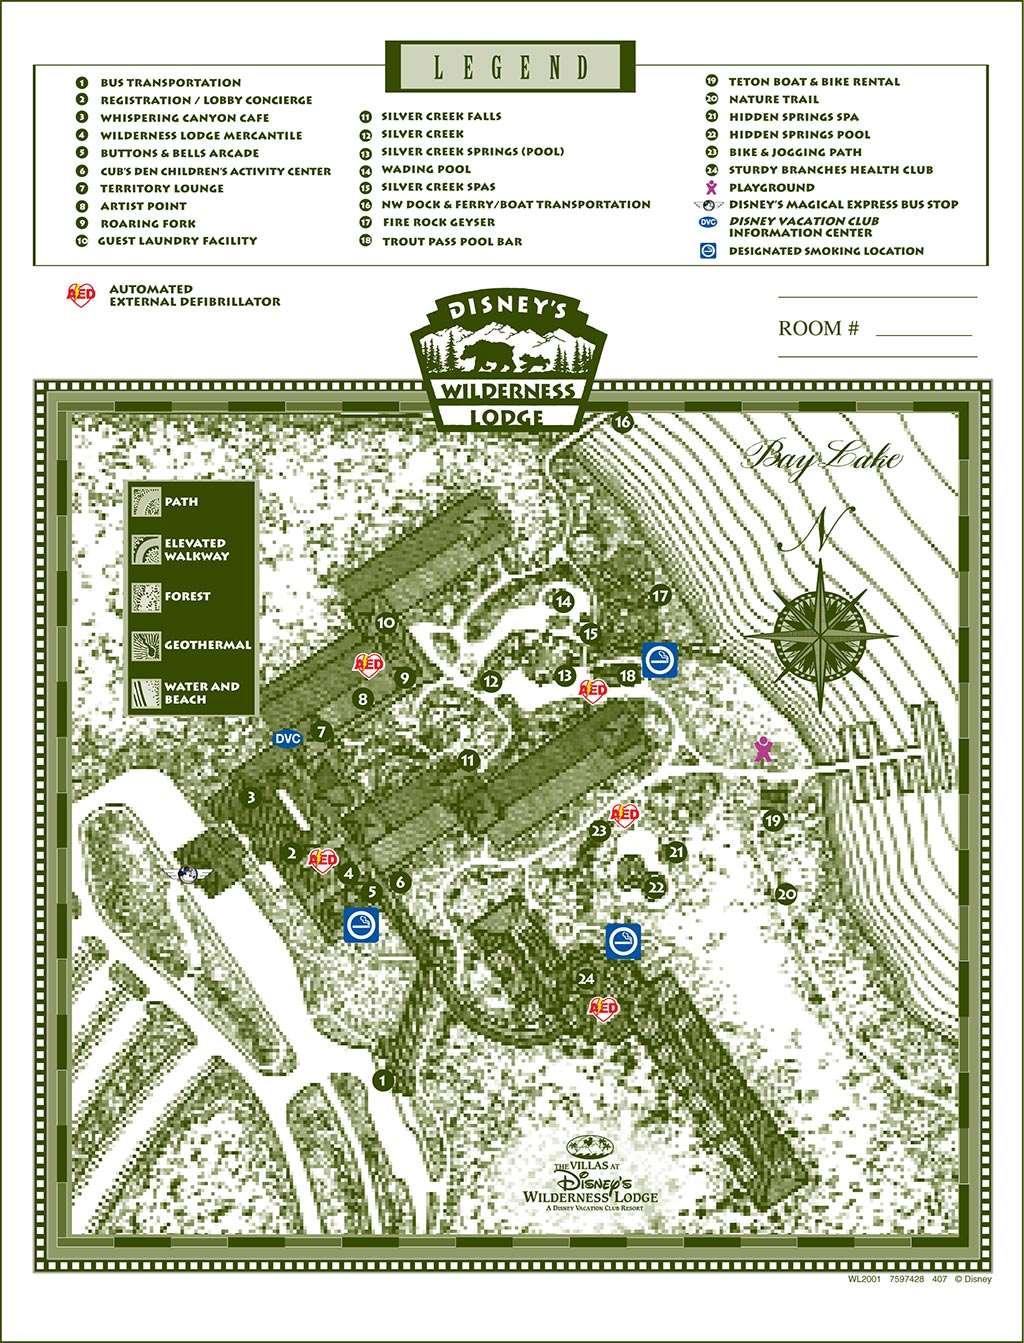 Resort Maps 2008 - Photo 10 of 17 on